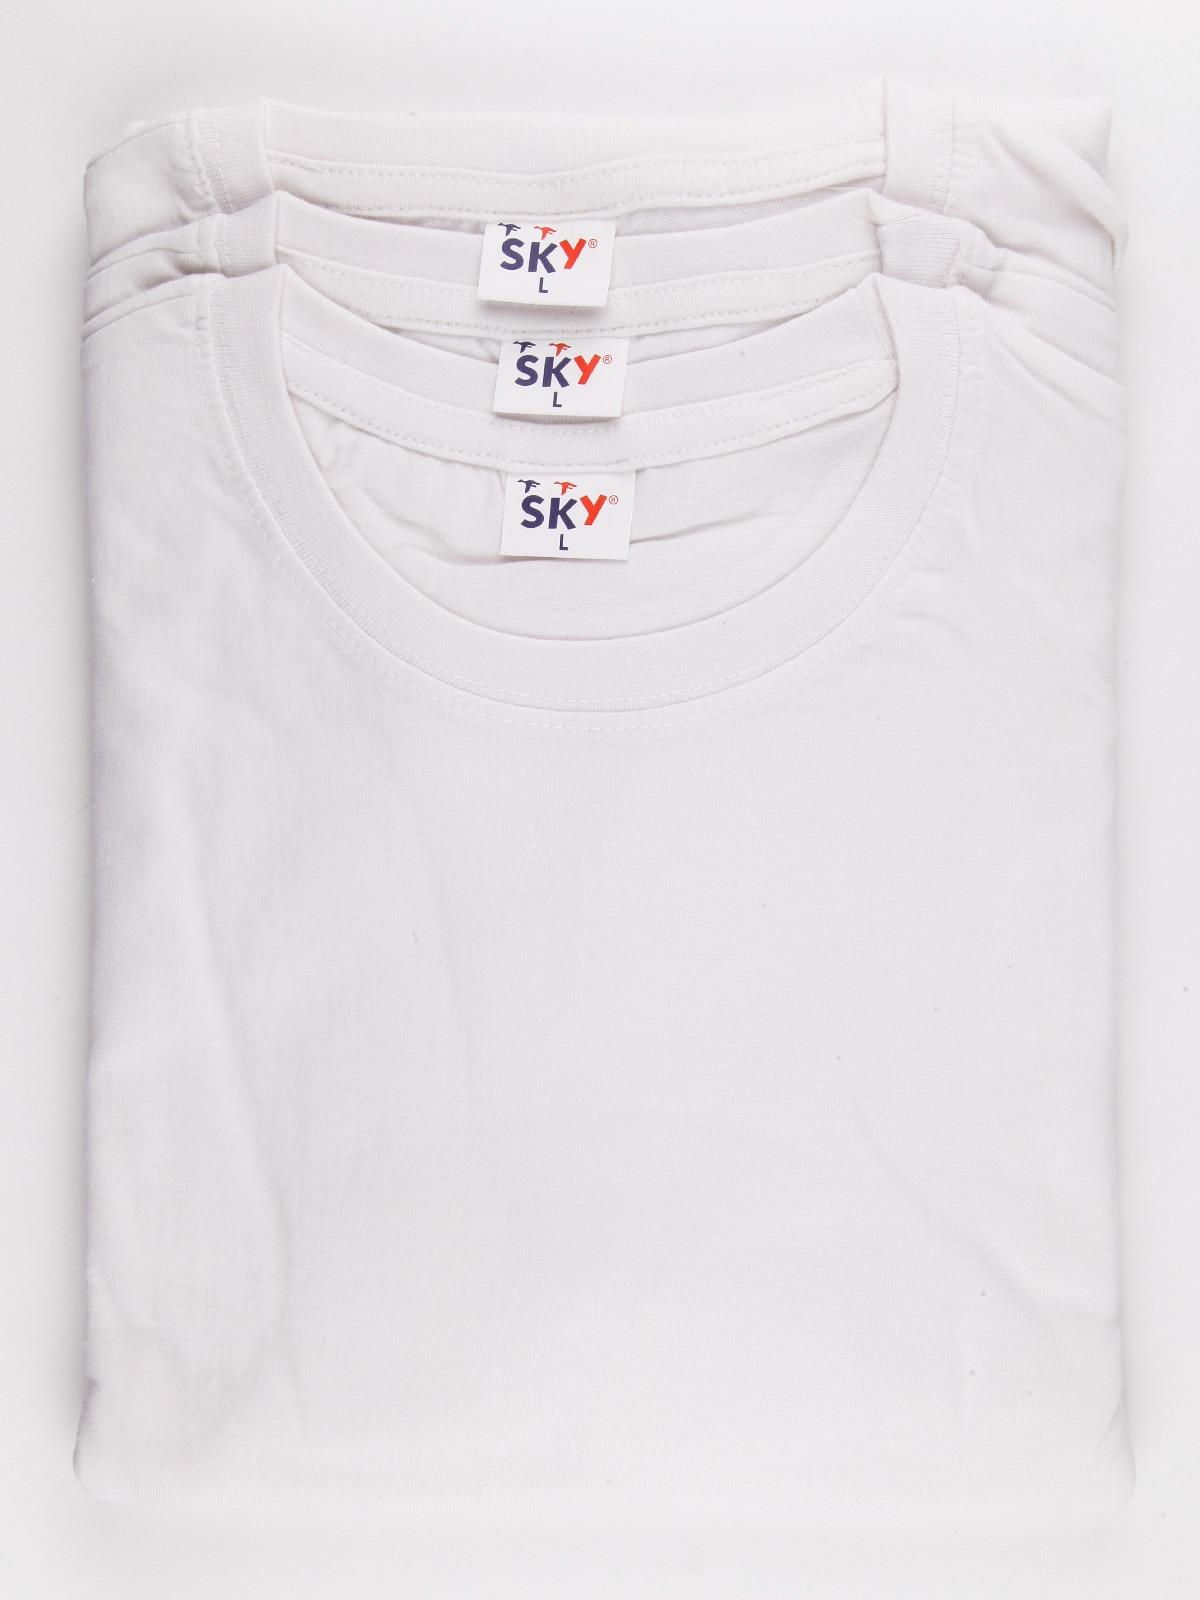 Camisetas de cuello redondo X3-plain